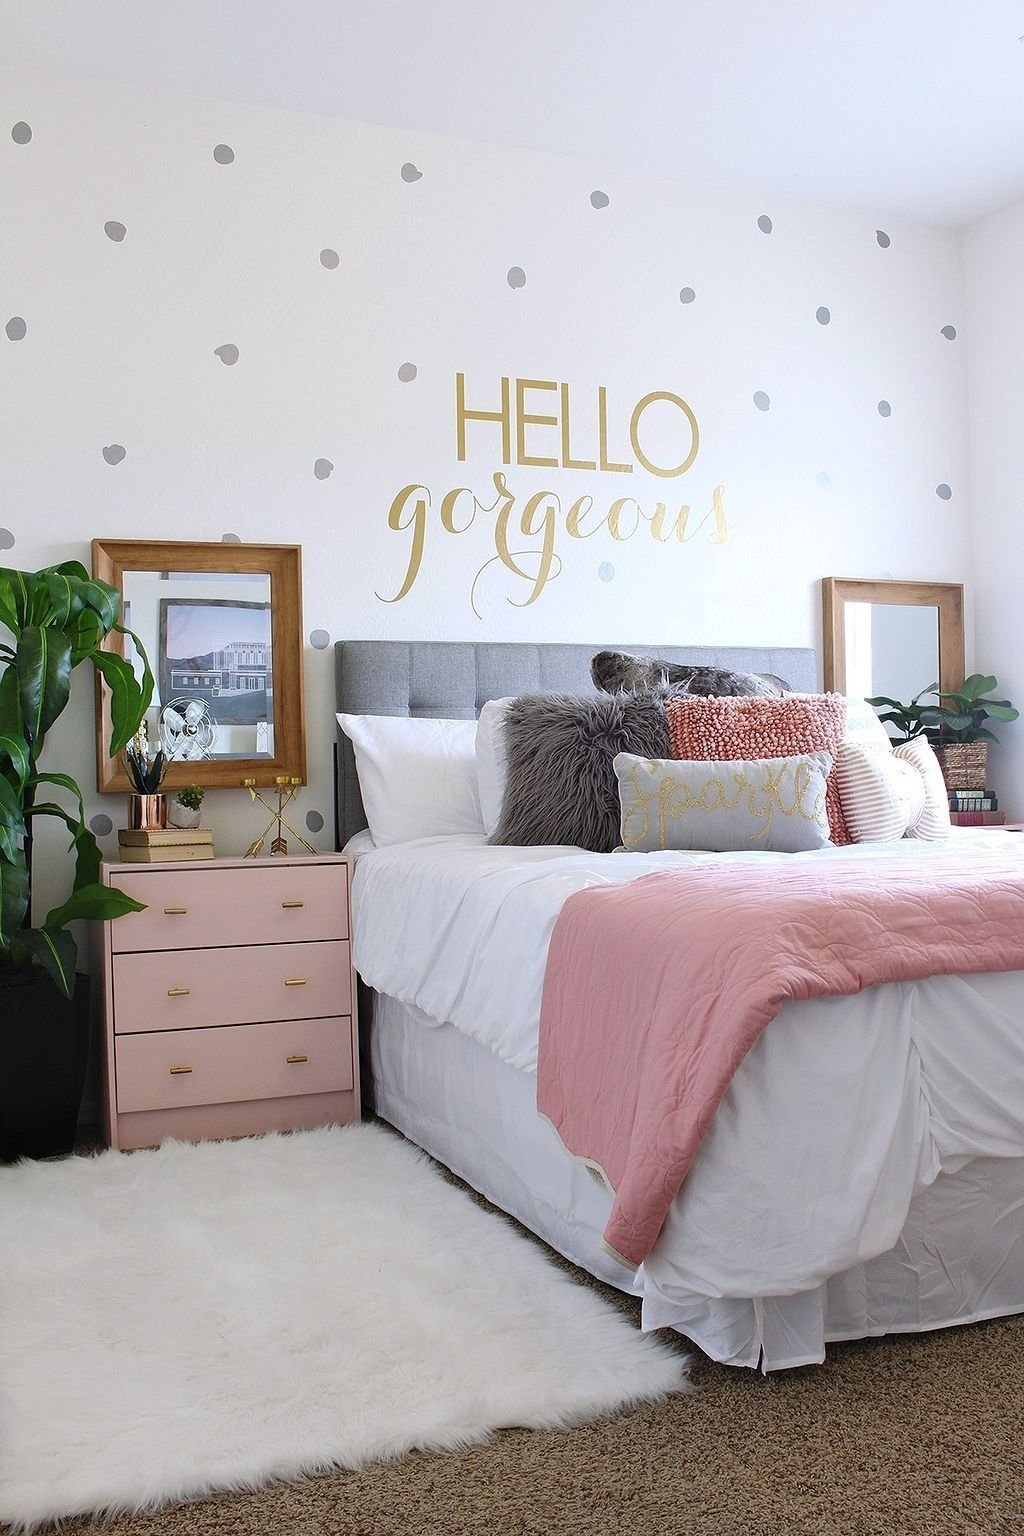 10 Fashionable Cute Bedroom Ideas For Teenage Girls 30 best teen girl bedroom ideas 36 sydney pinterest teen 2020